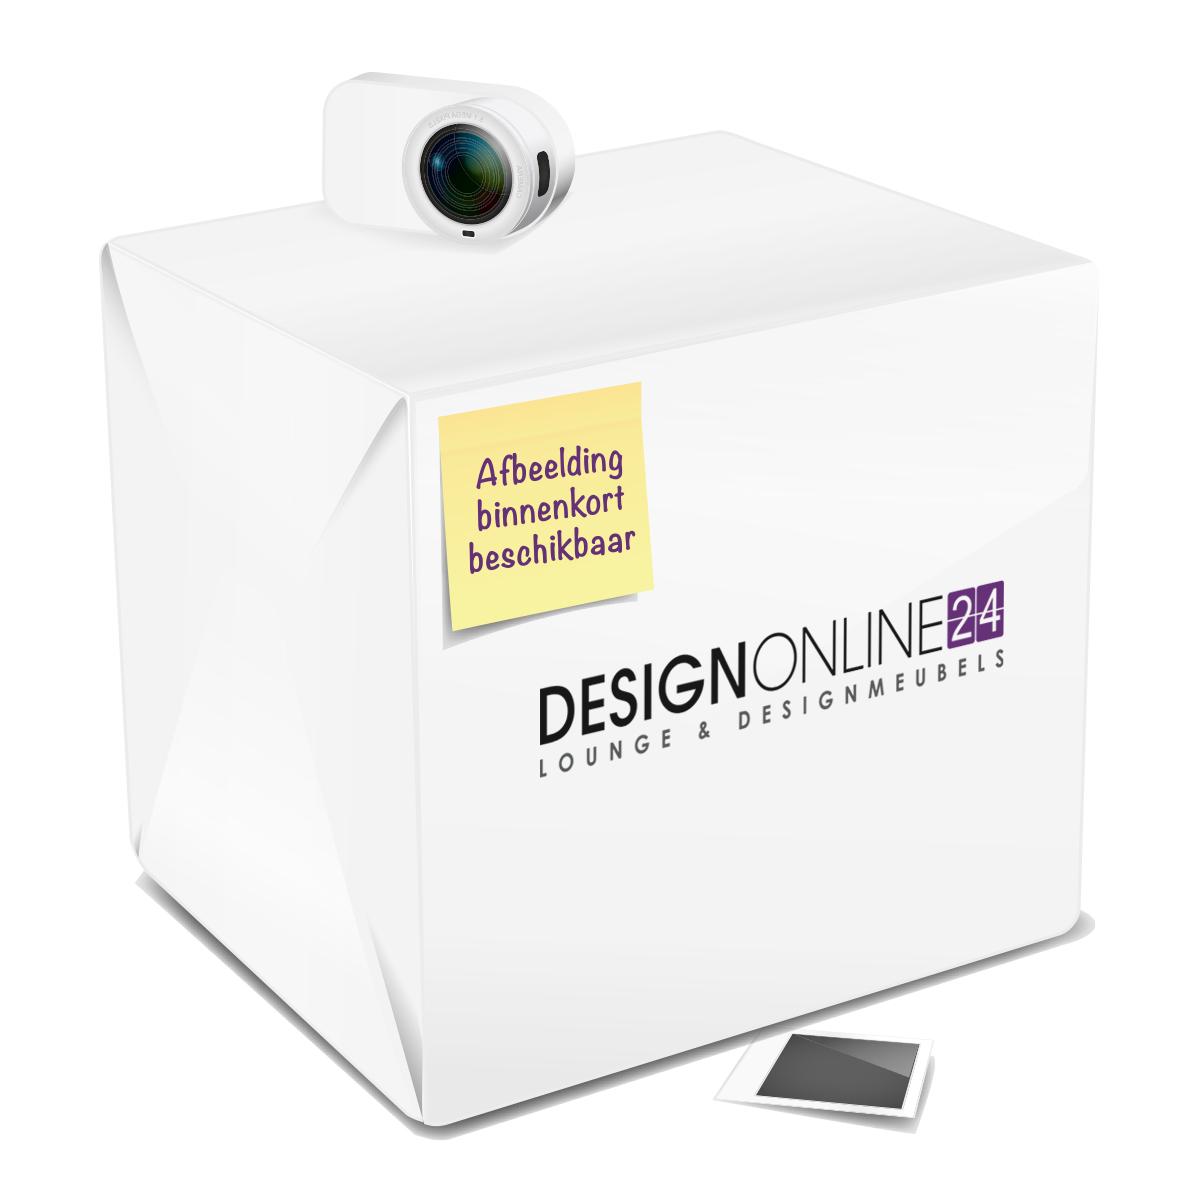 design booglampen kopen designonline24